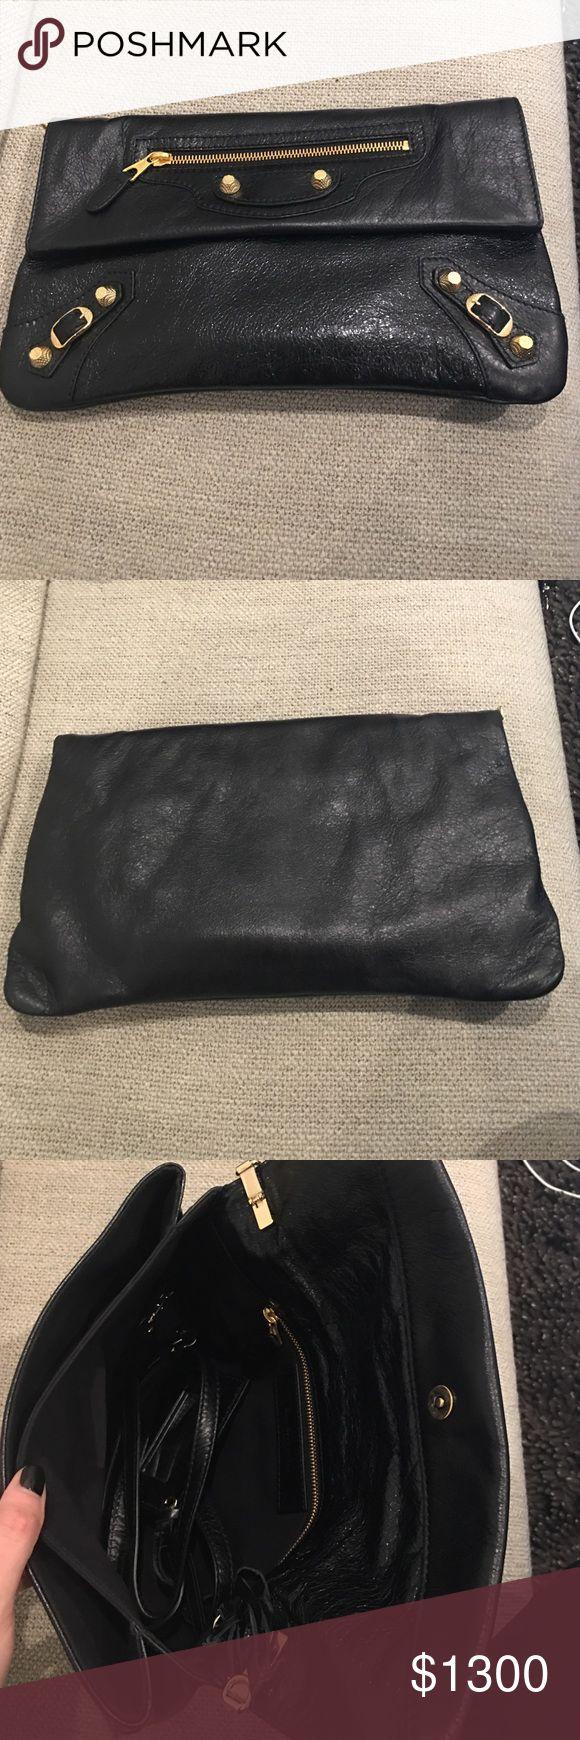 Balenciaga clutch /with cross body strap Gold hardware leather Balenciaga Bags Clutches & Wristlets